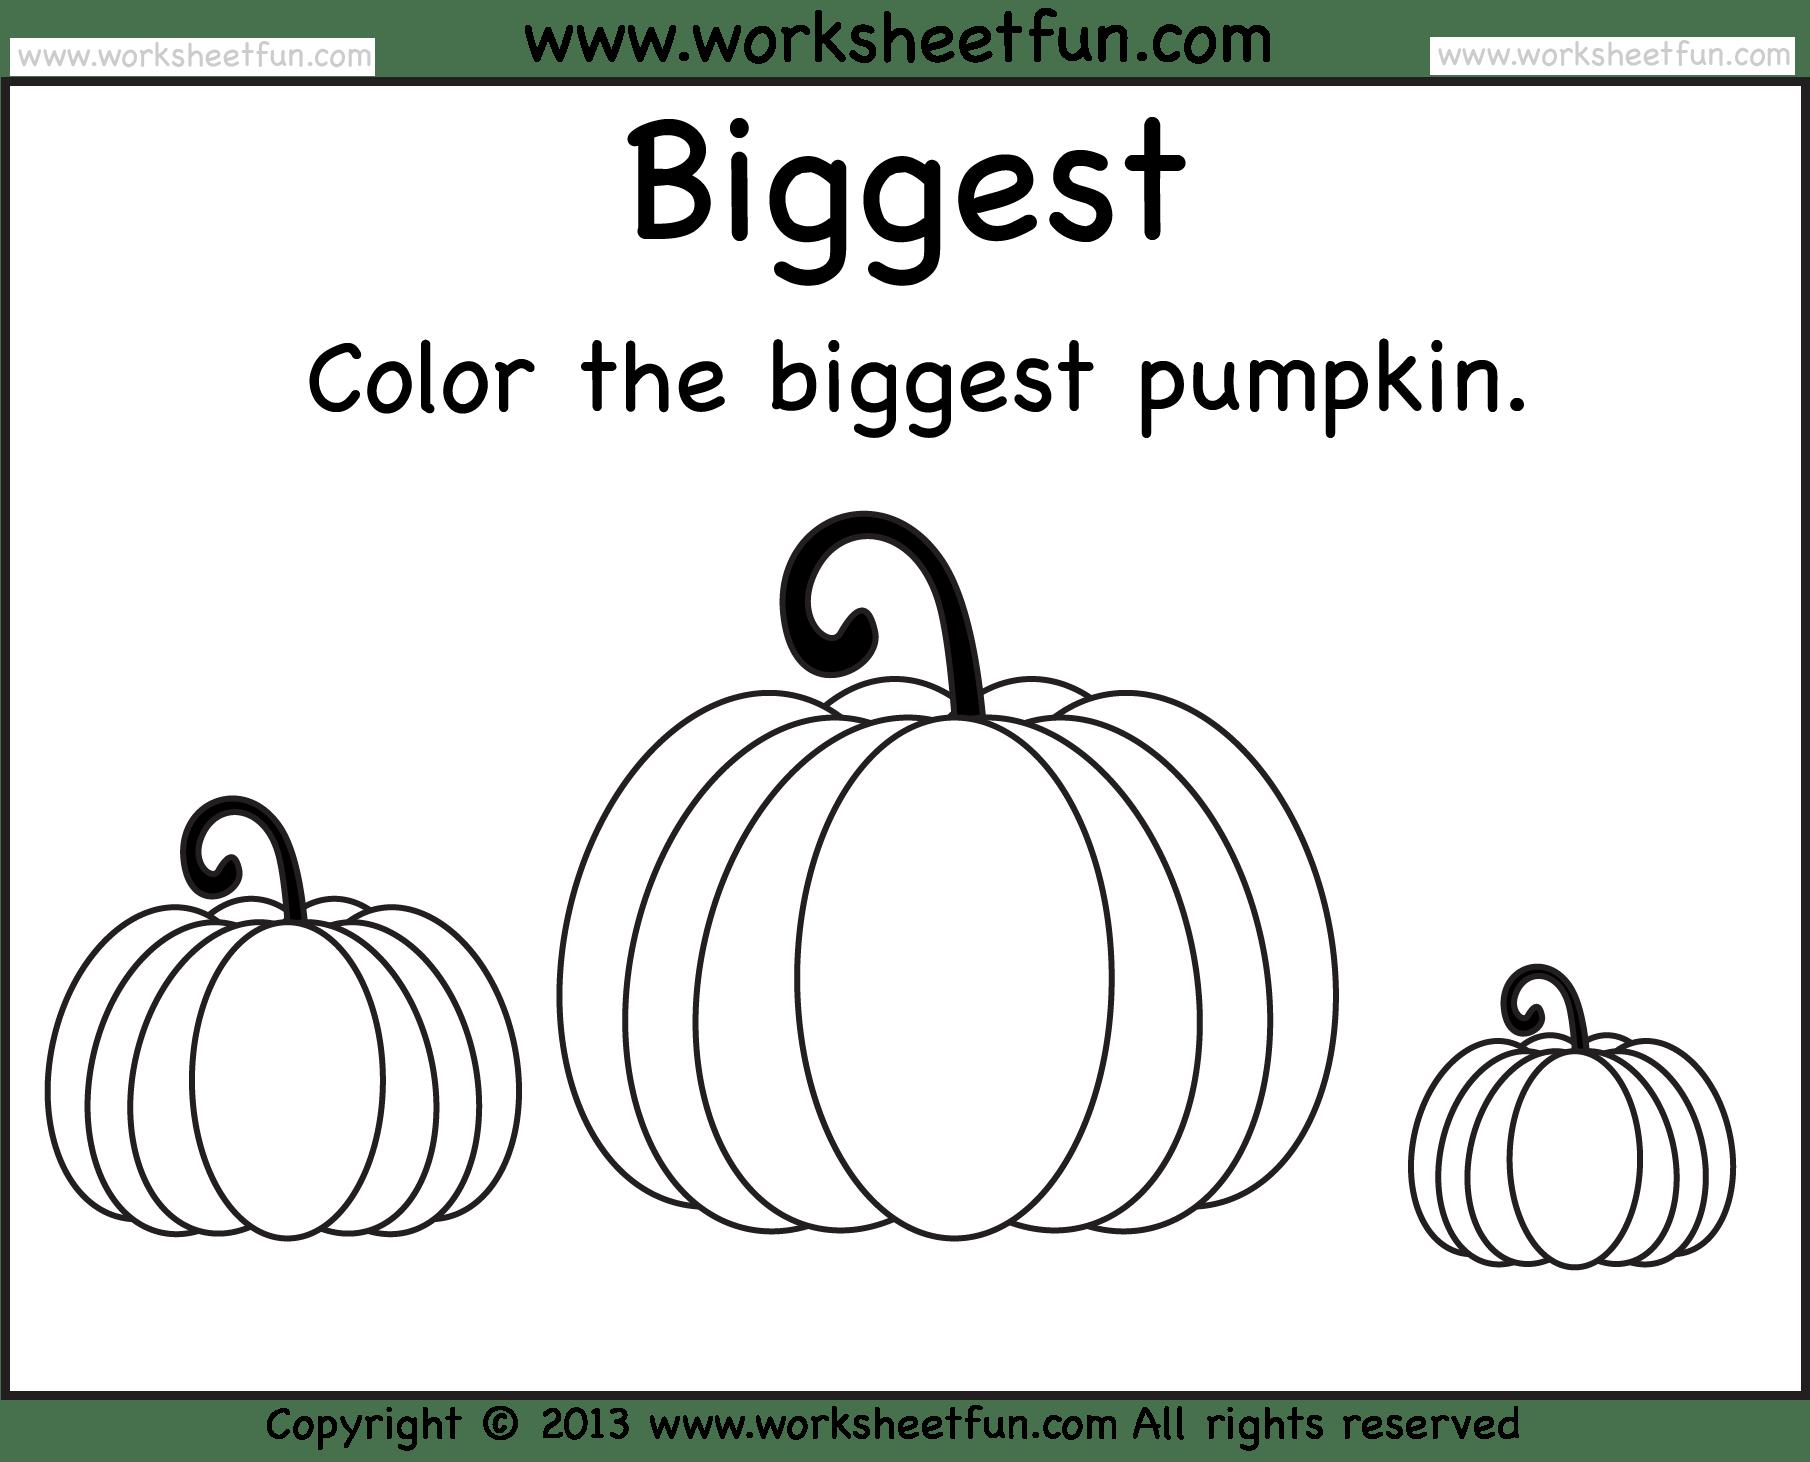 hight resolution of Biggest and Smallest Pumpkin – 2 Worksheets / FREE Printable Worksheets –  Worksheetfun